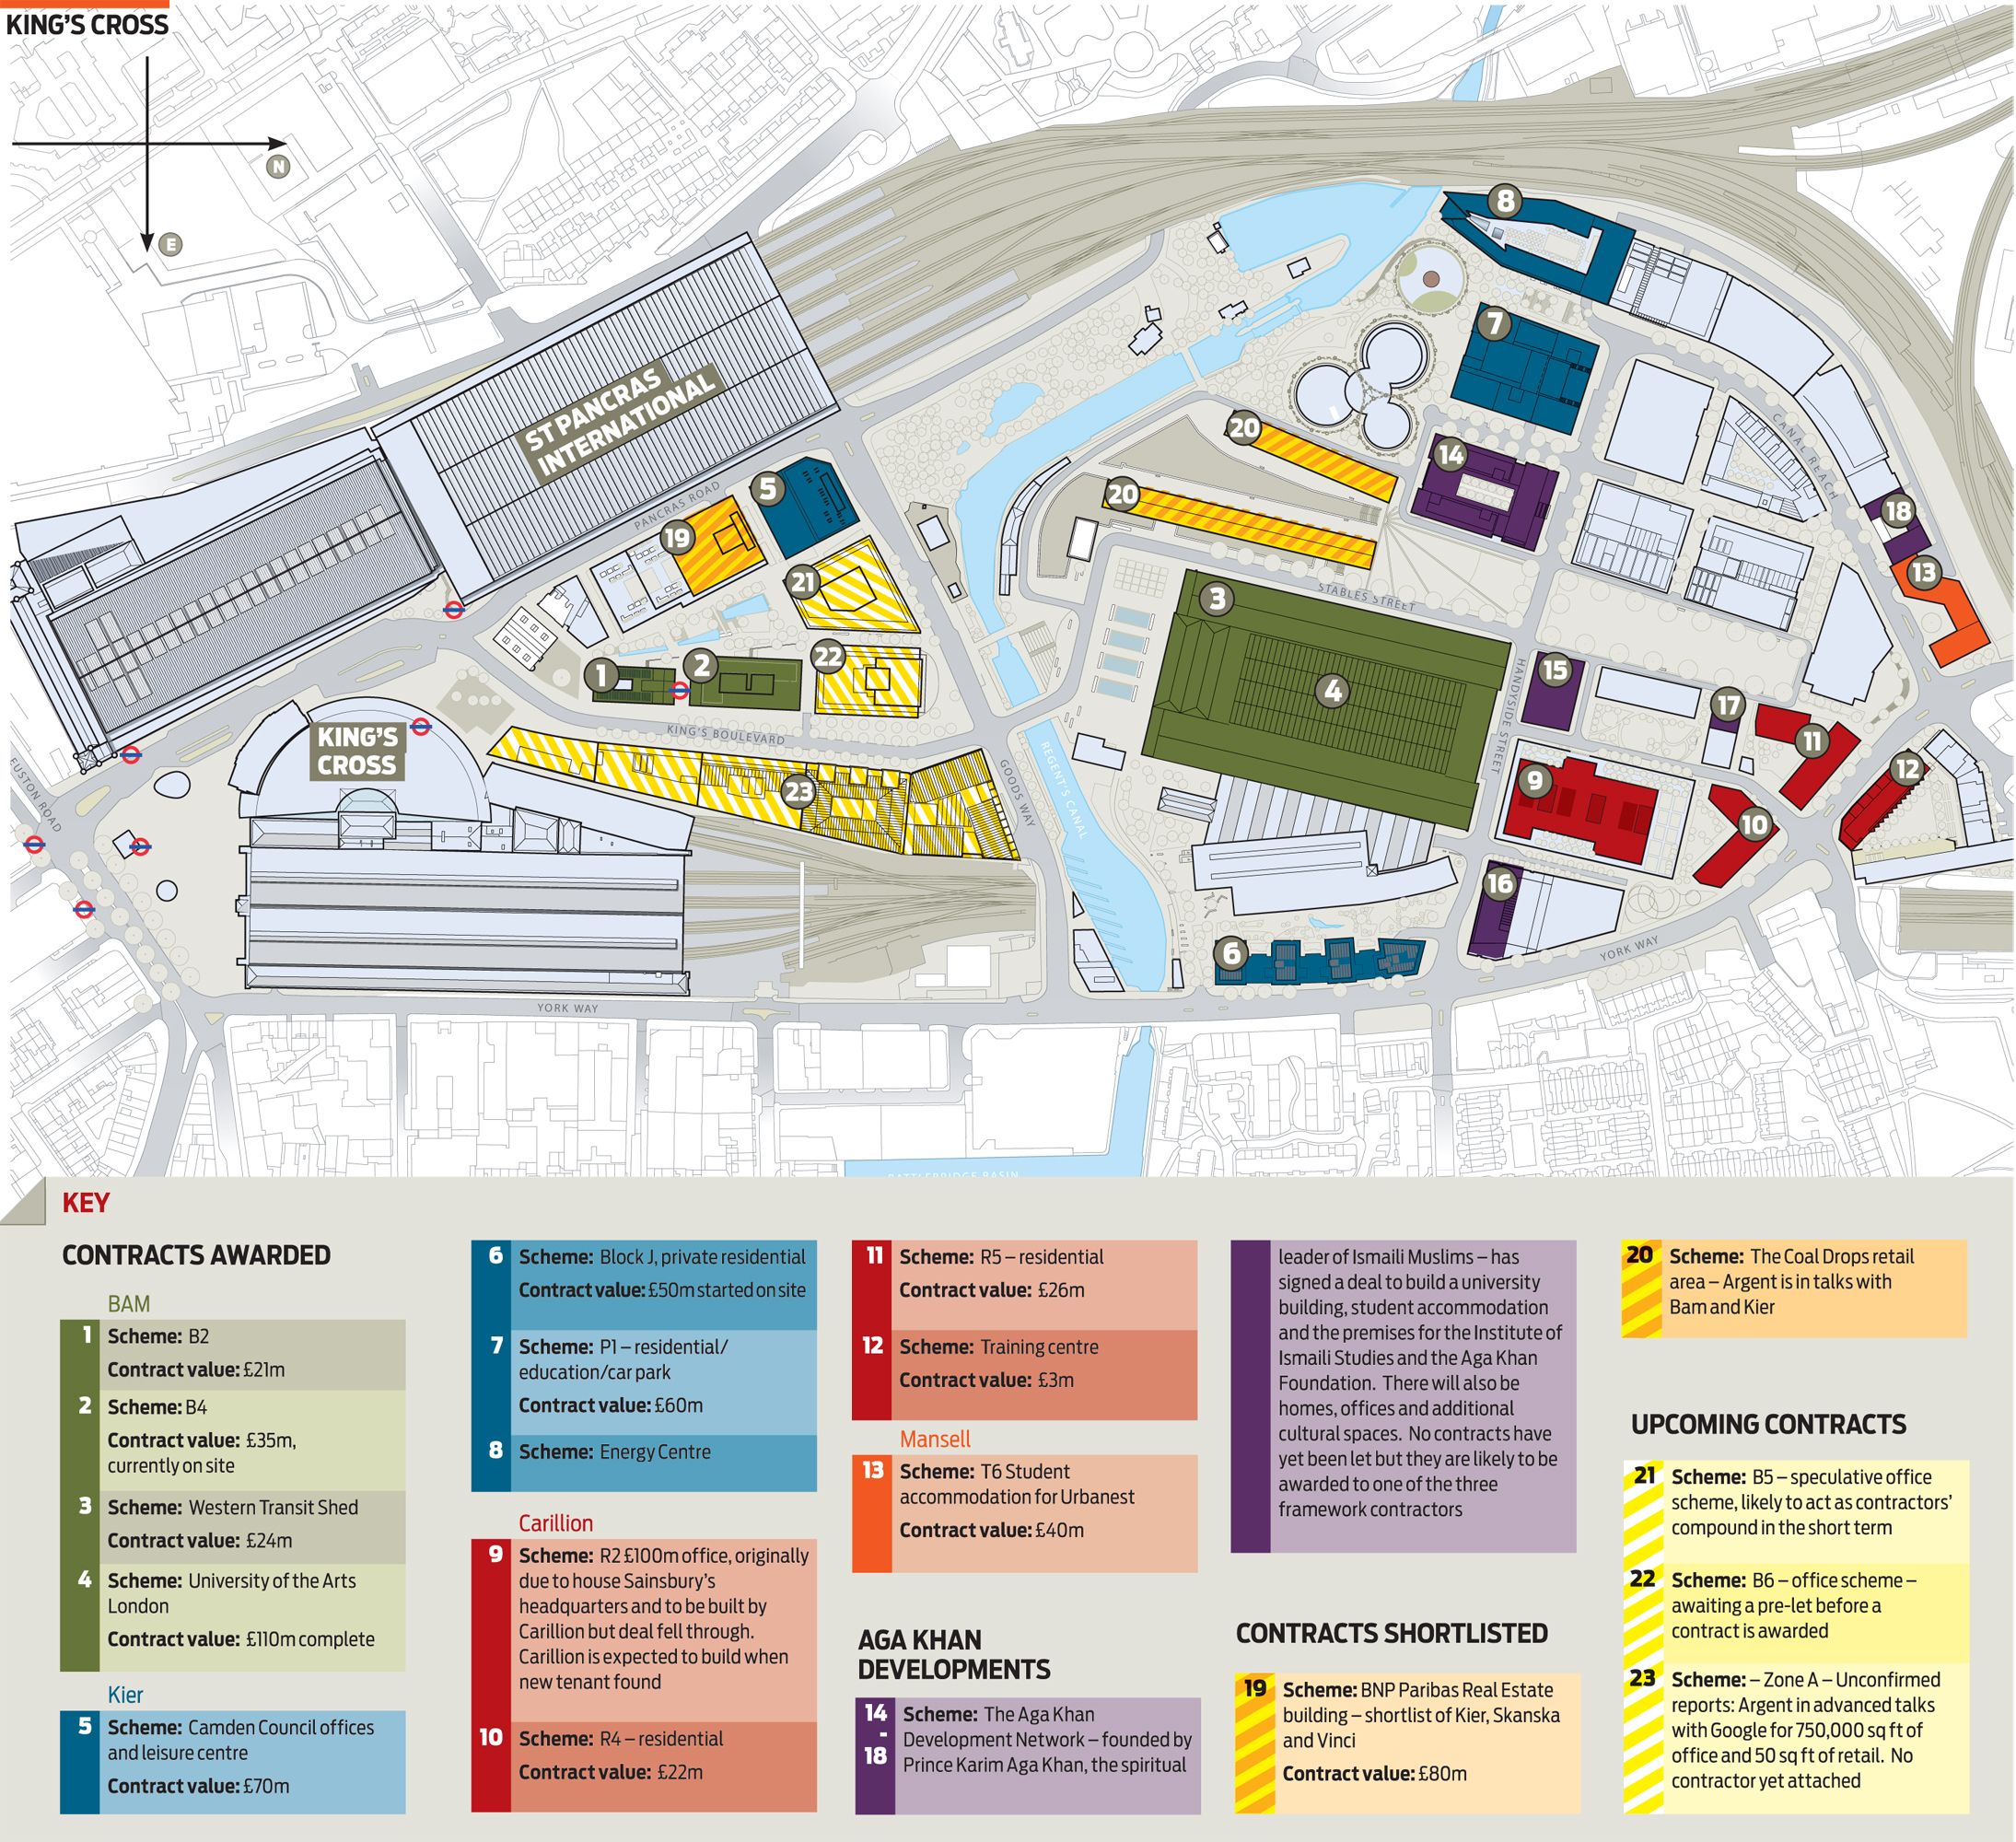 Network Floor Plan Layout Aga Khan Development Network Plots Within The Kings Cross